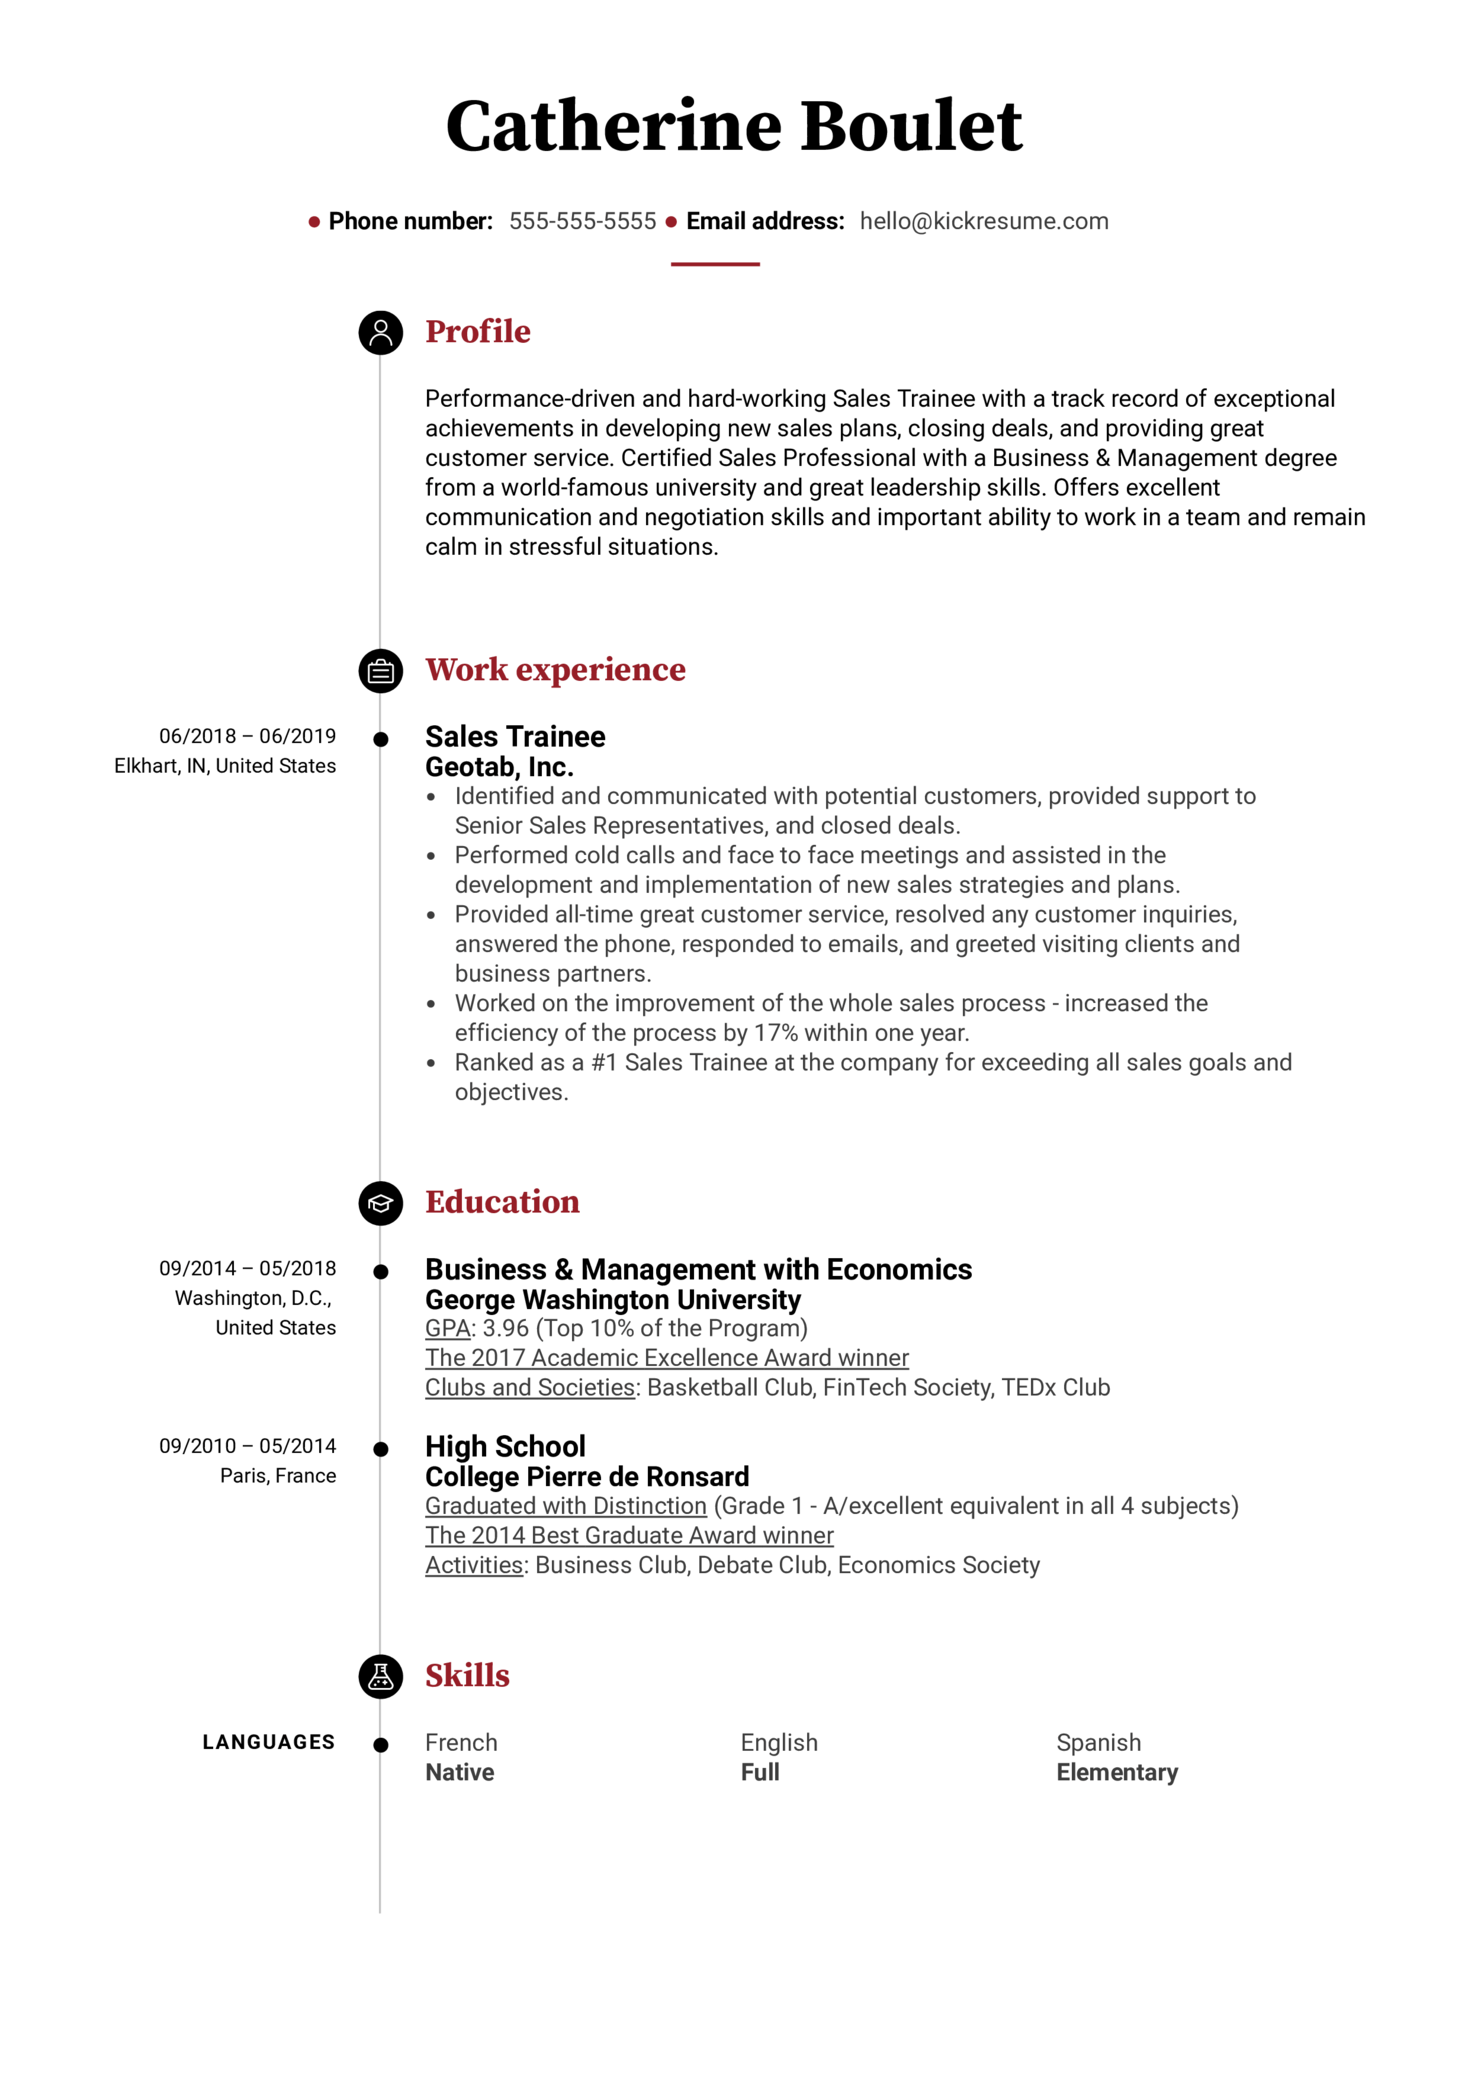 Sales Trainee Resume Example (parte 1)